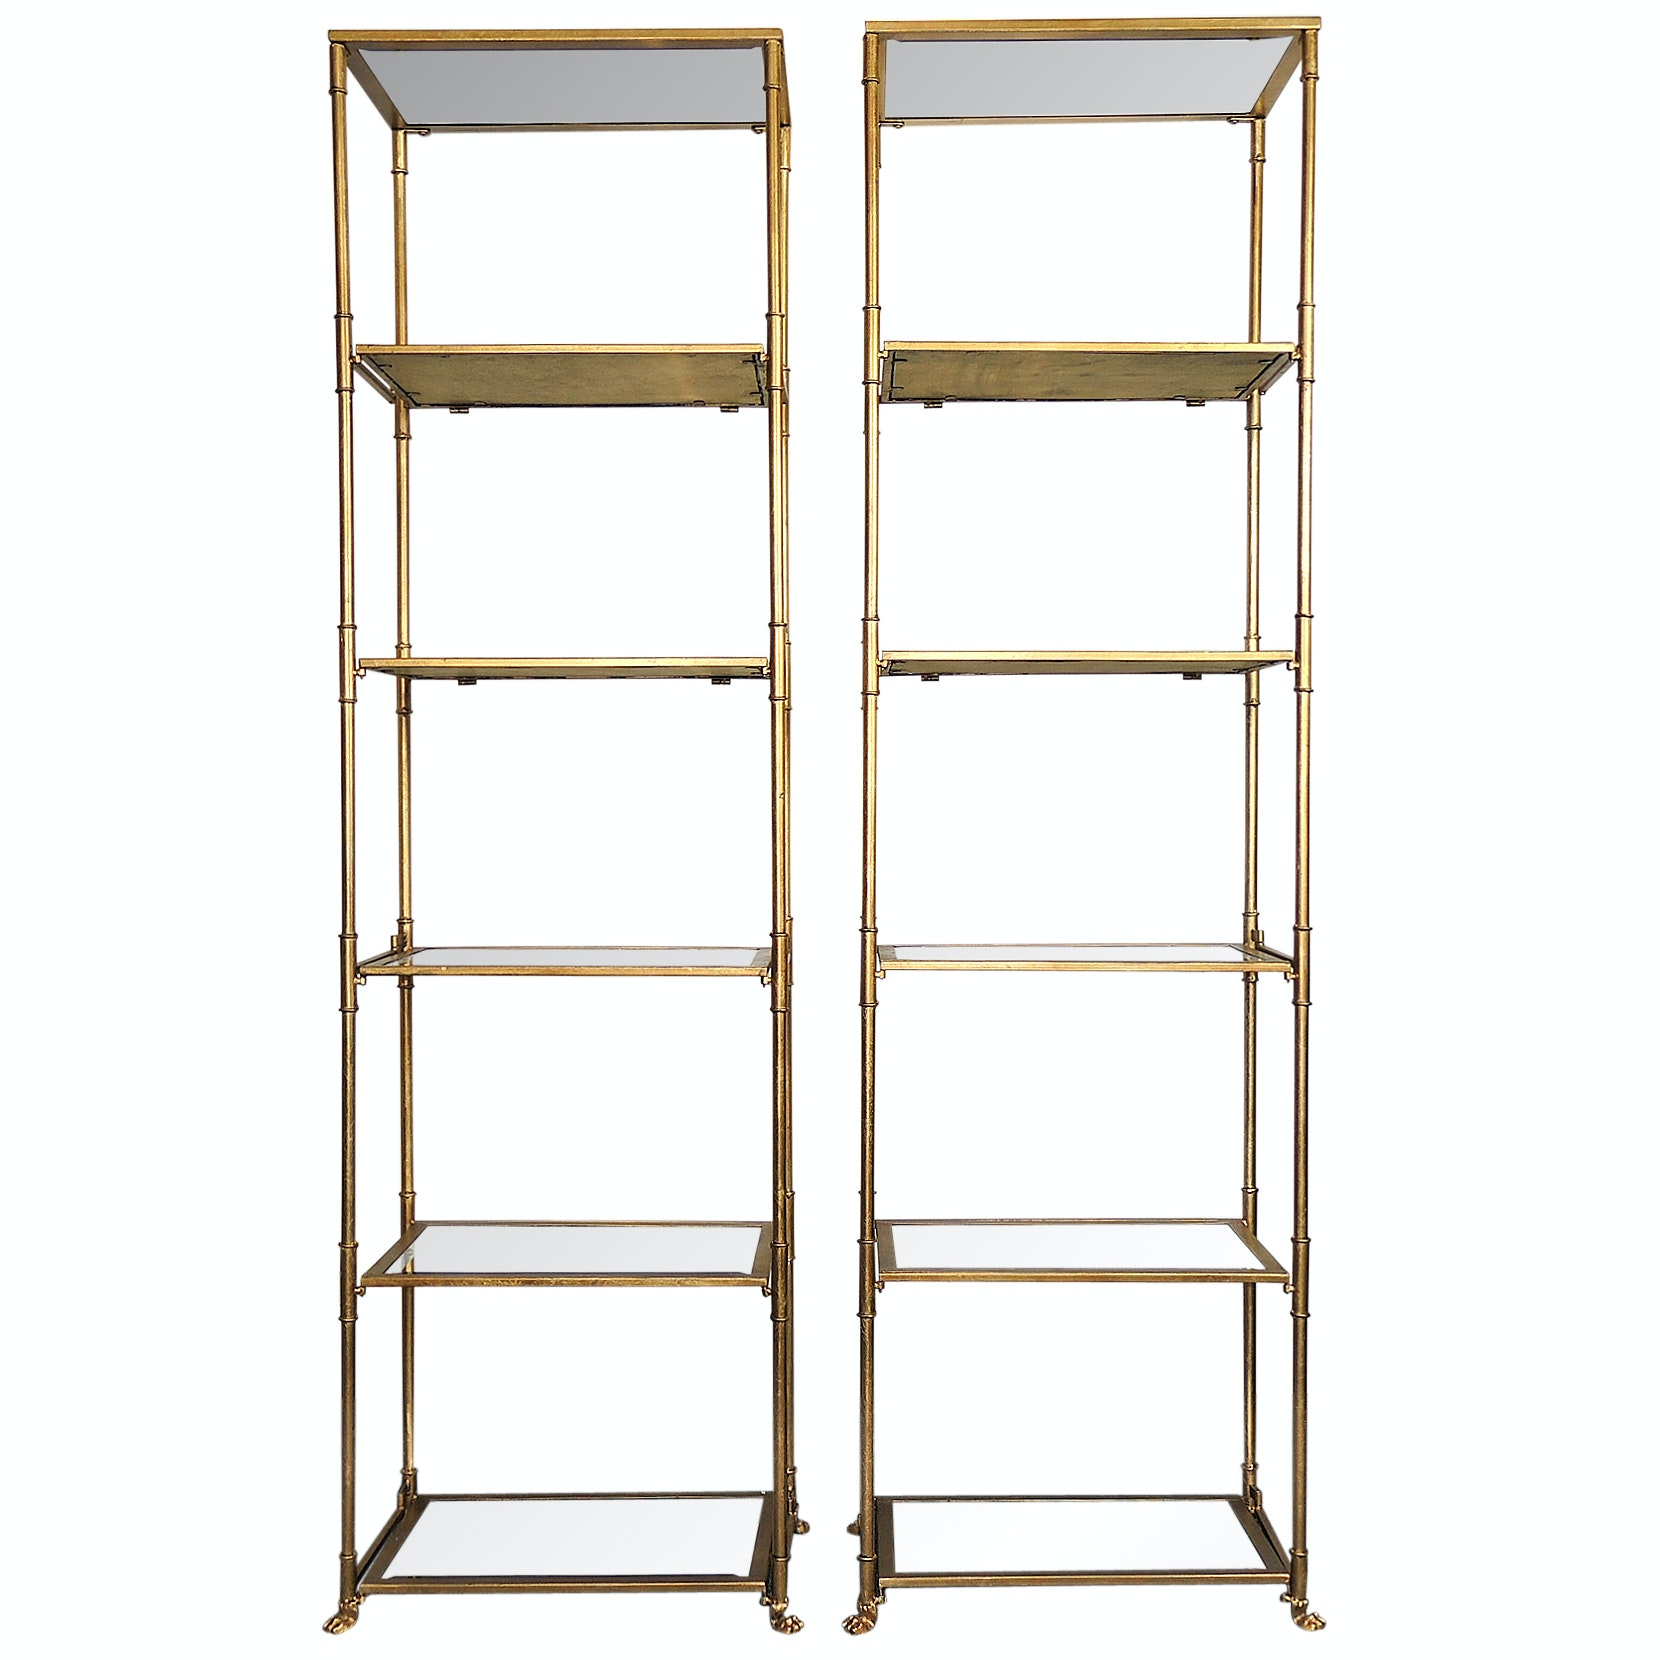 Mirror Shelf and Gold Toned Étagères